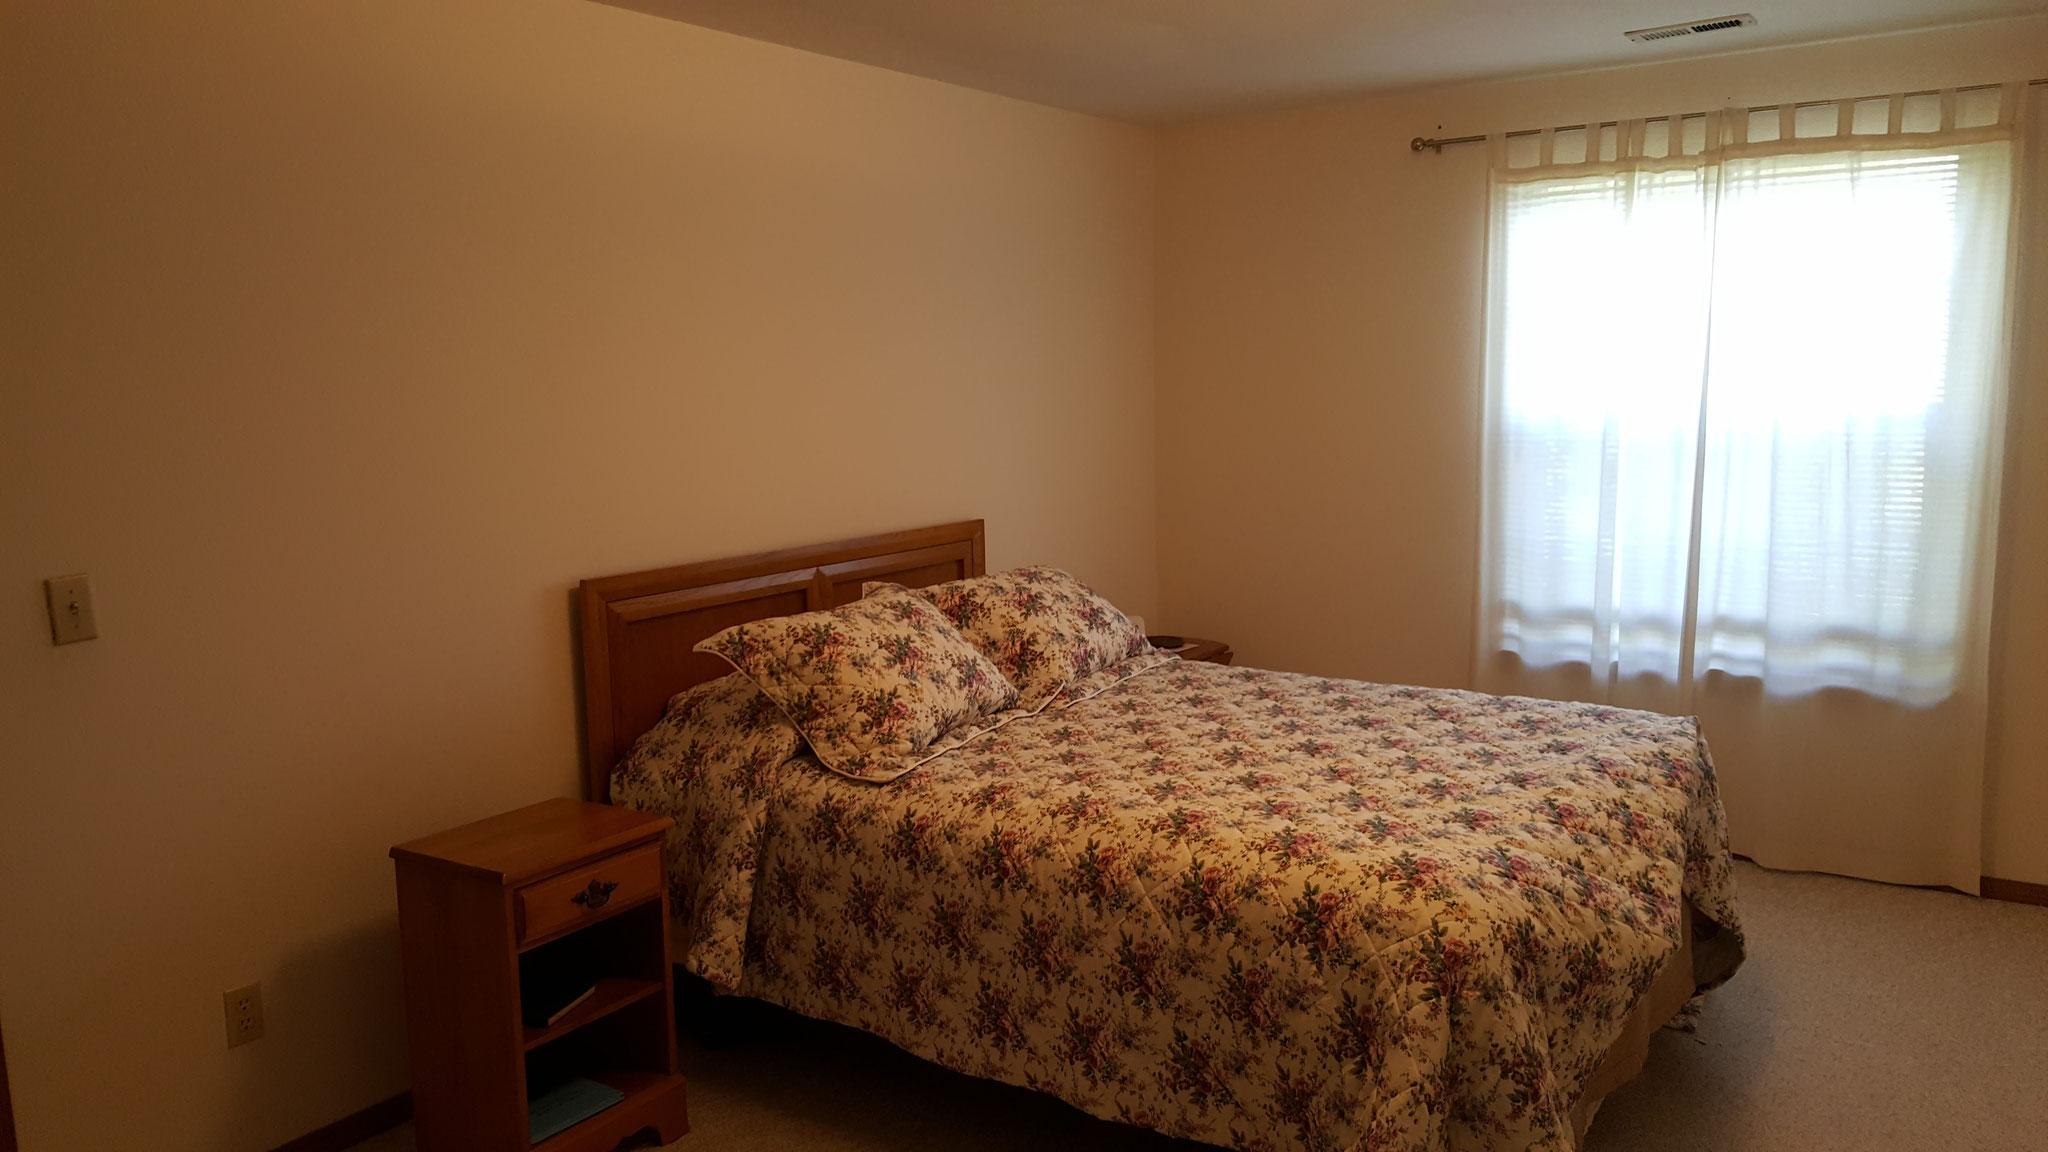 Bedroom Before Staging